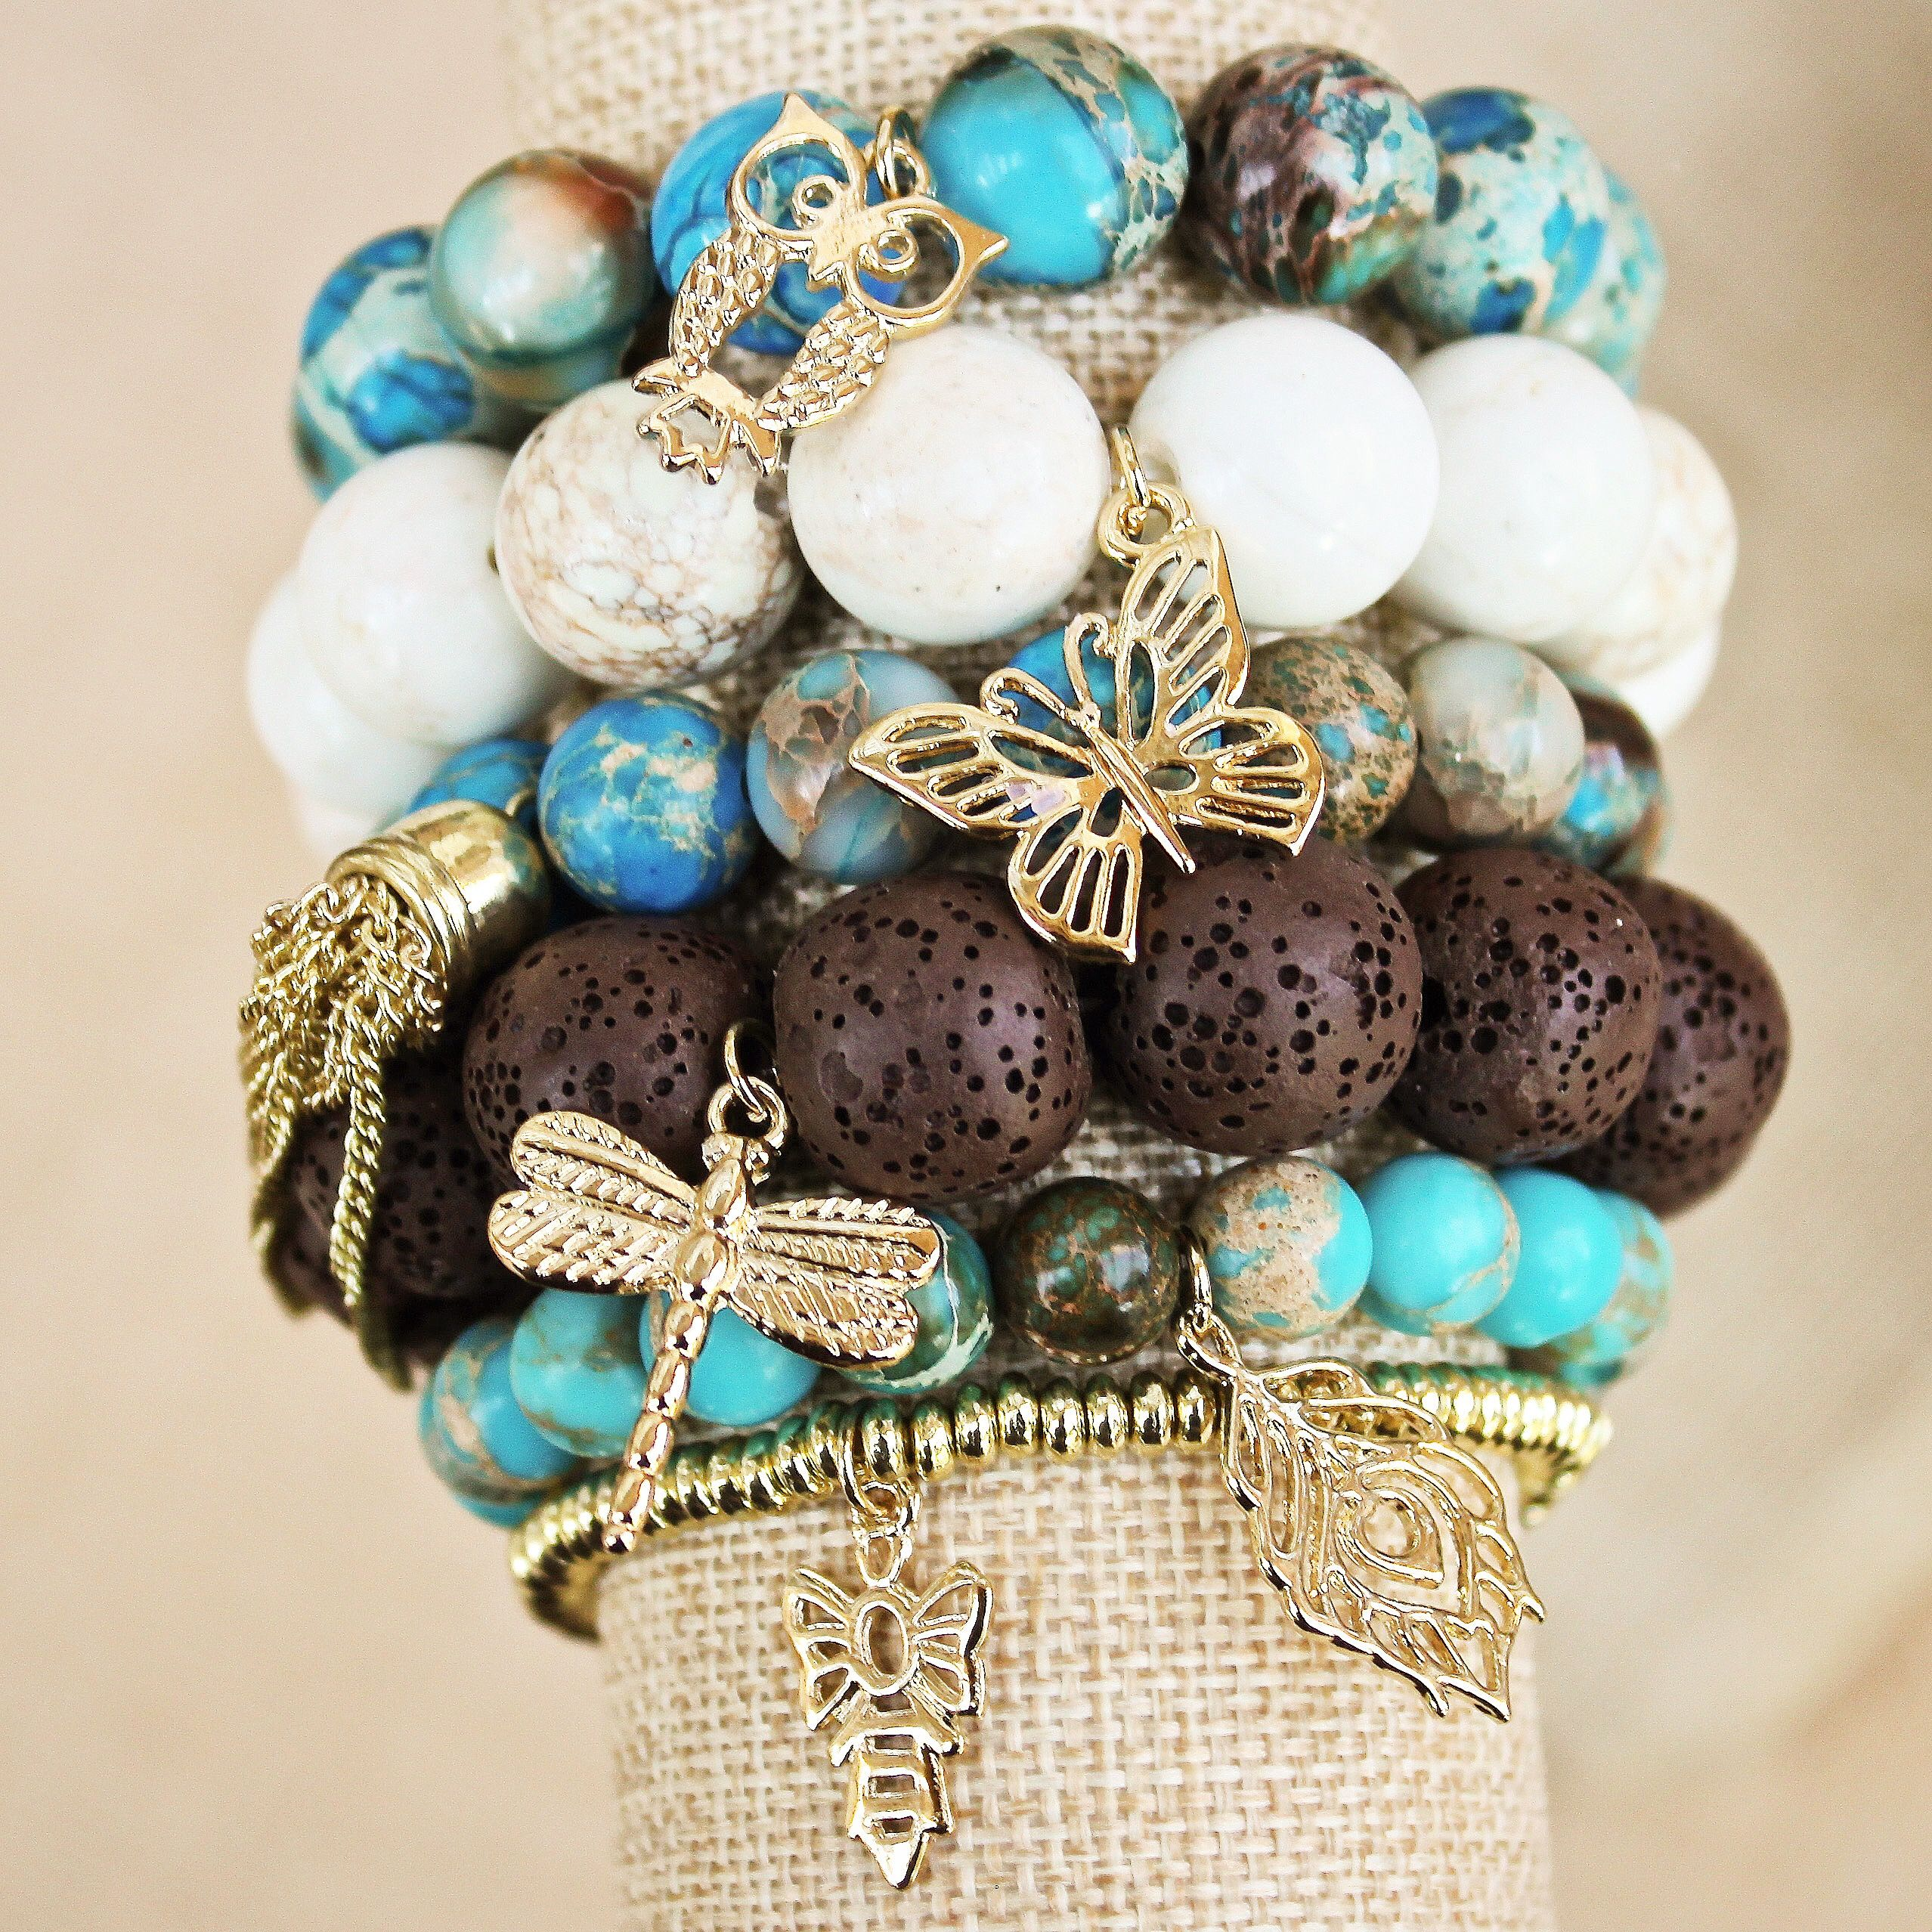 Bohemian boho charm stretch bracelets designed by Denise Yezbak Moore for www.halcraft.com